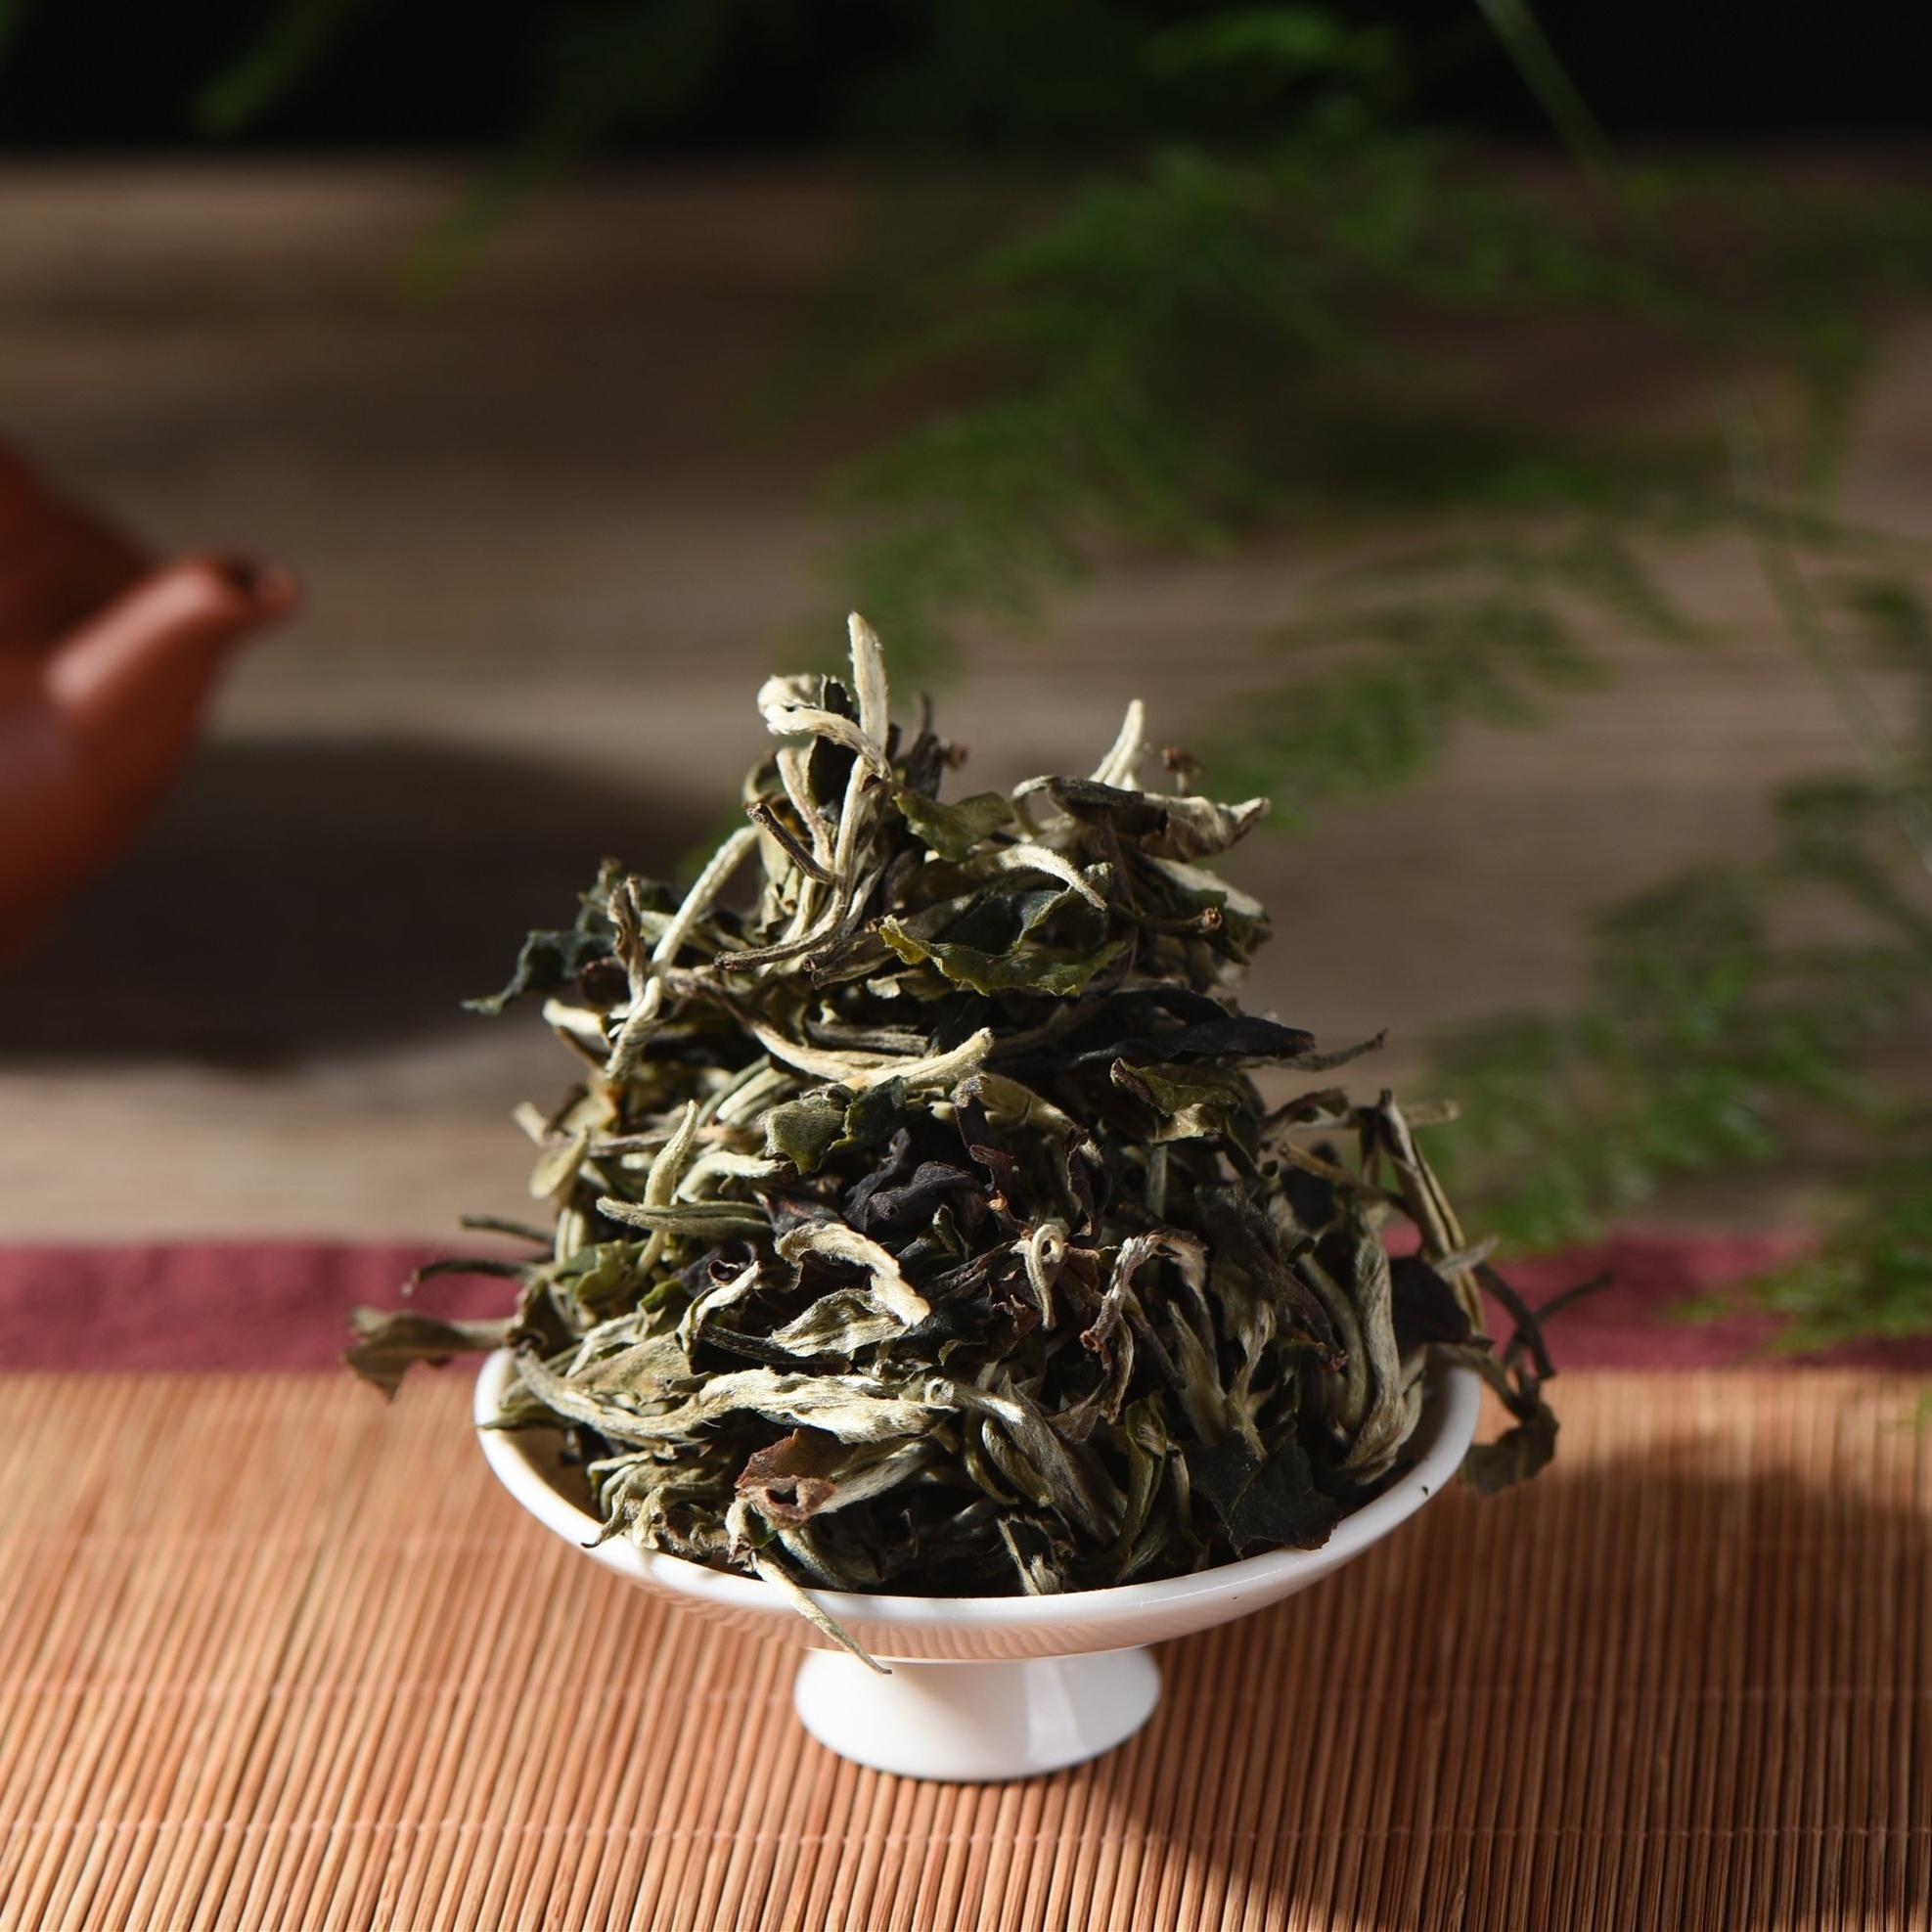 Cheap and good organic white tea baihao yinzhen from yunnan city - 4uTea | 4uTea.com